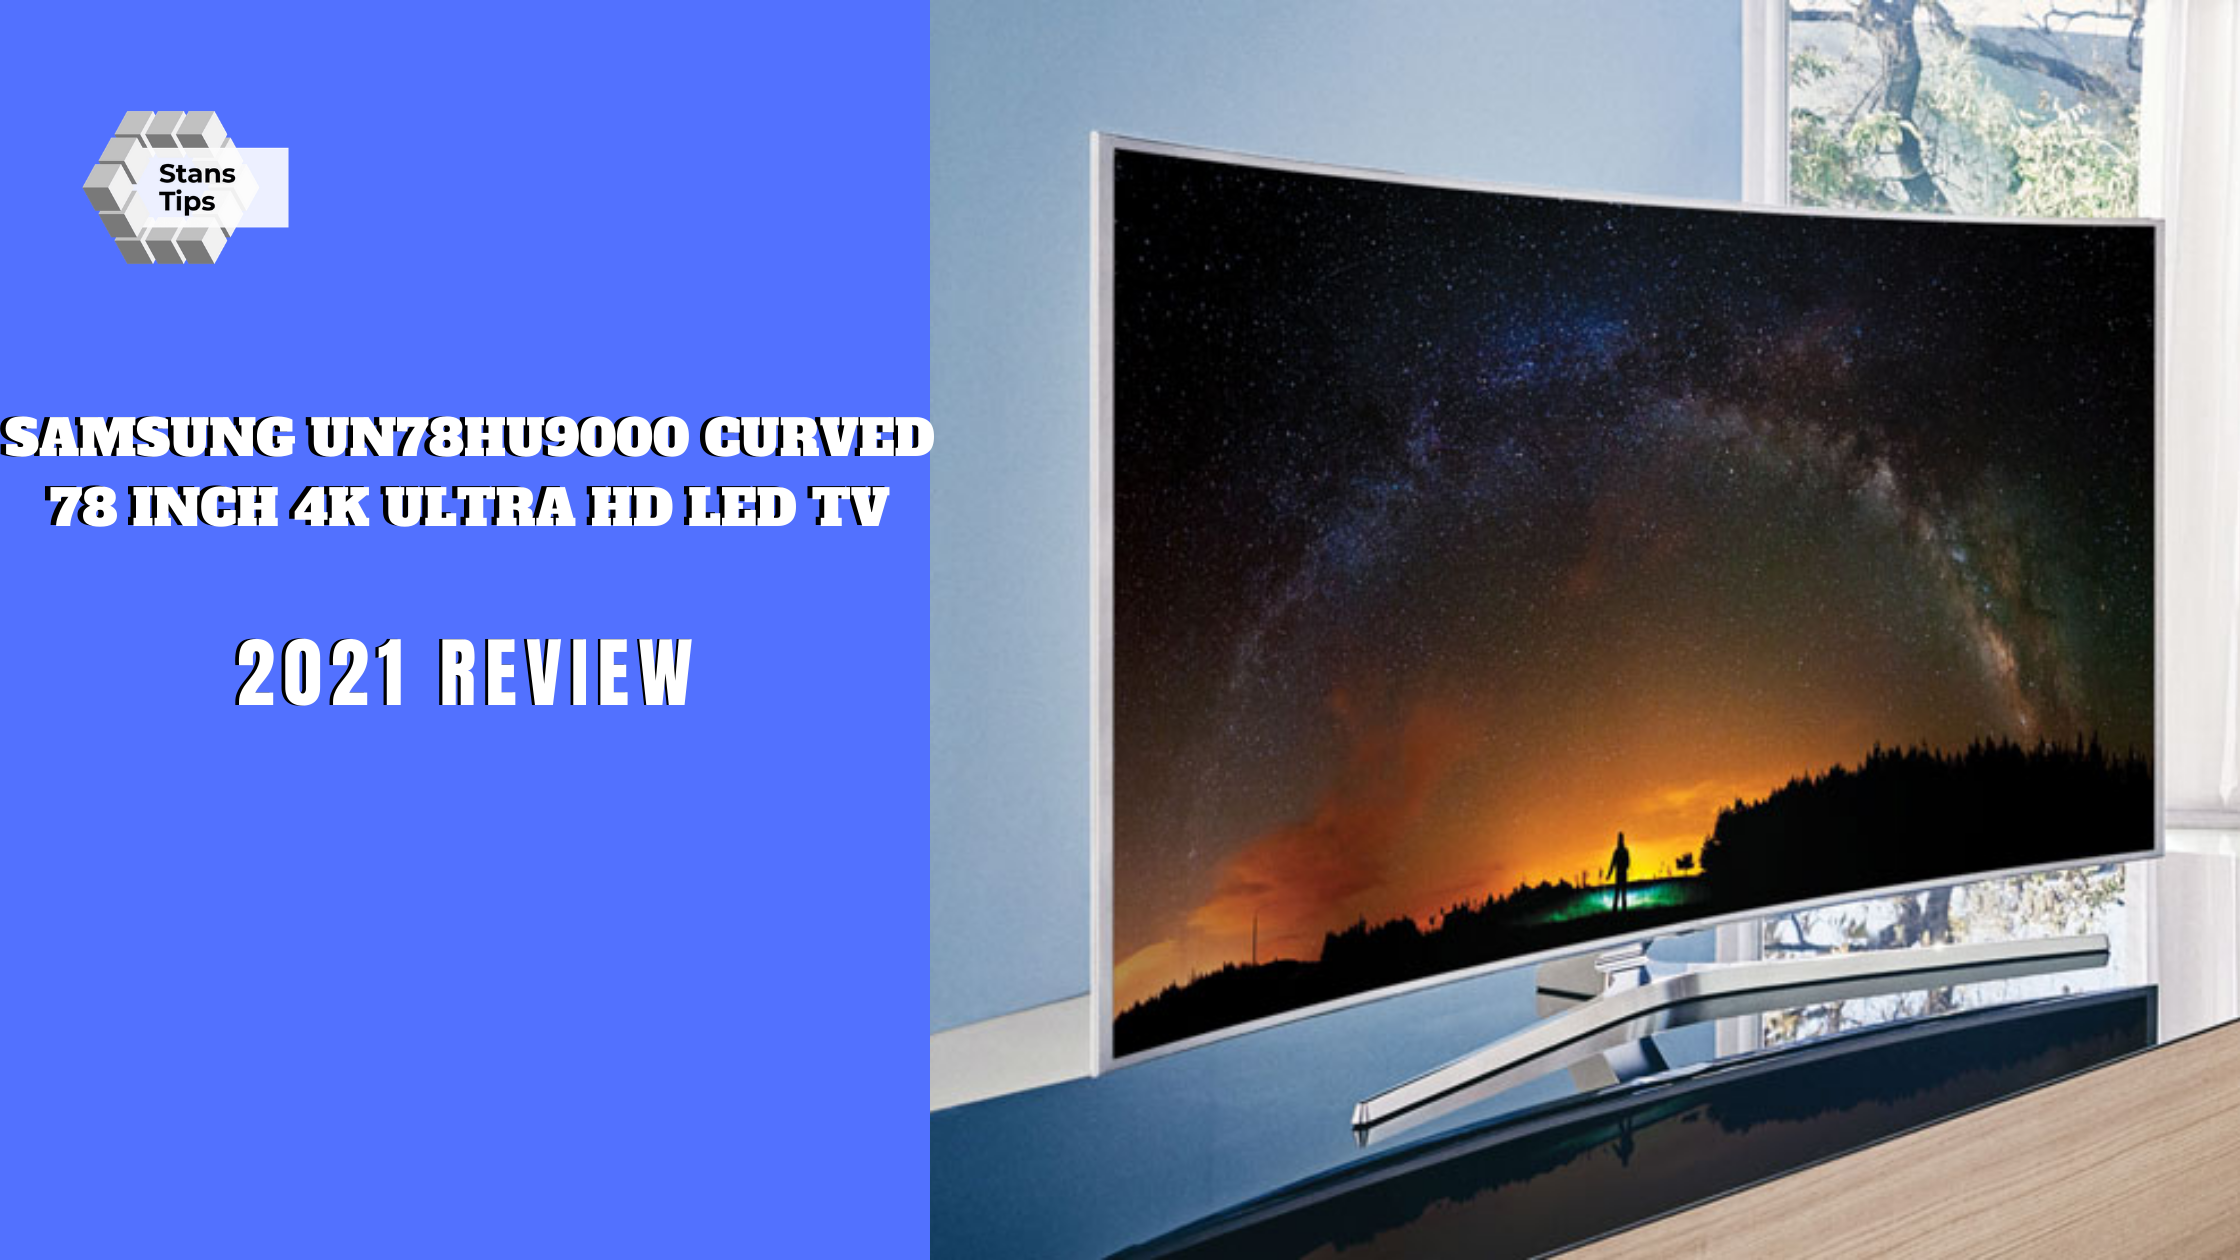 Samsung un78hu9000 curved 78 inch 4k ultra hd 120hz 3d led tv